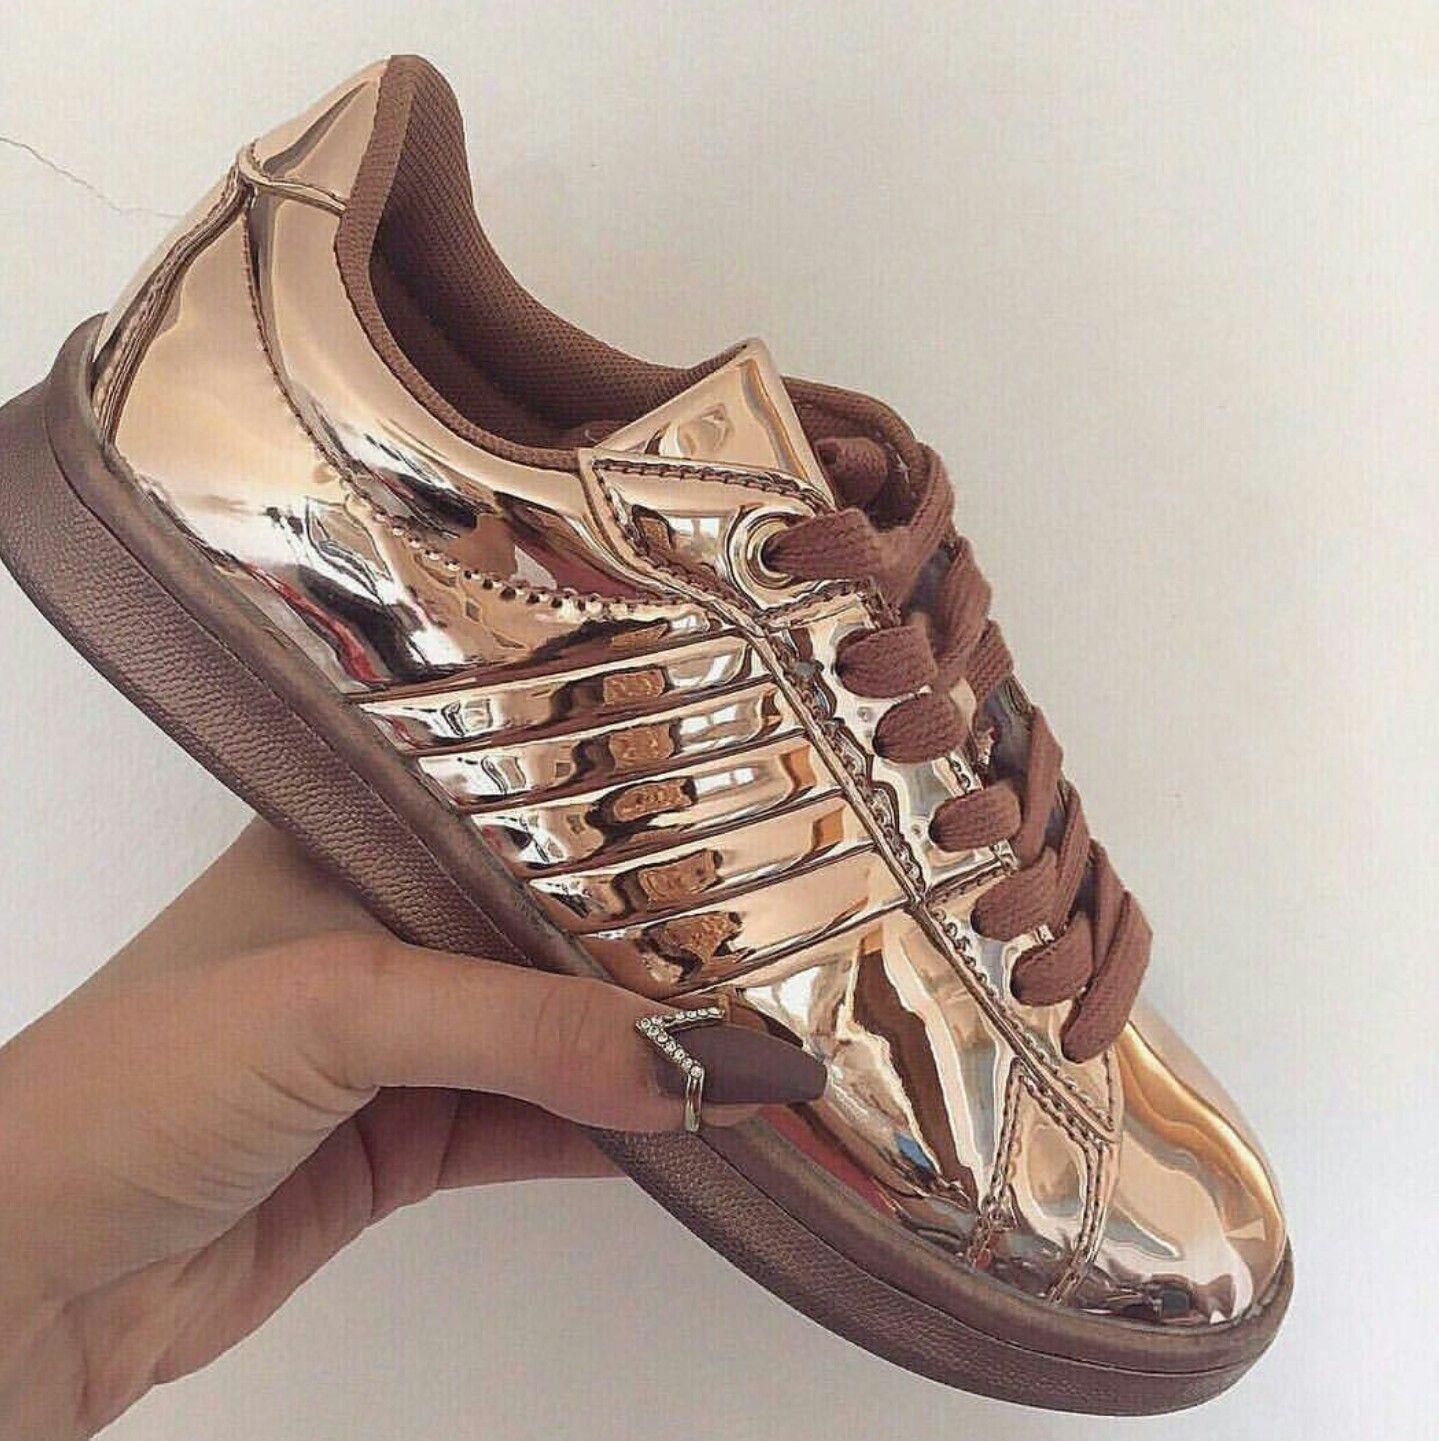 pinterest adidas des chaussures d'hommes courir http: / /